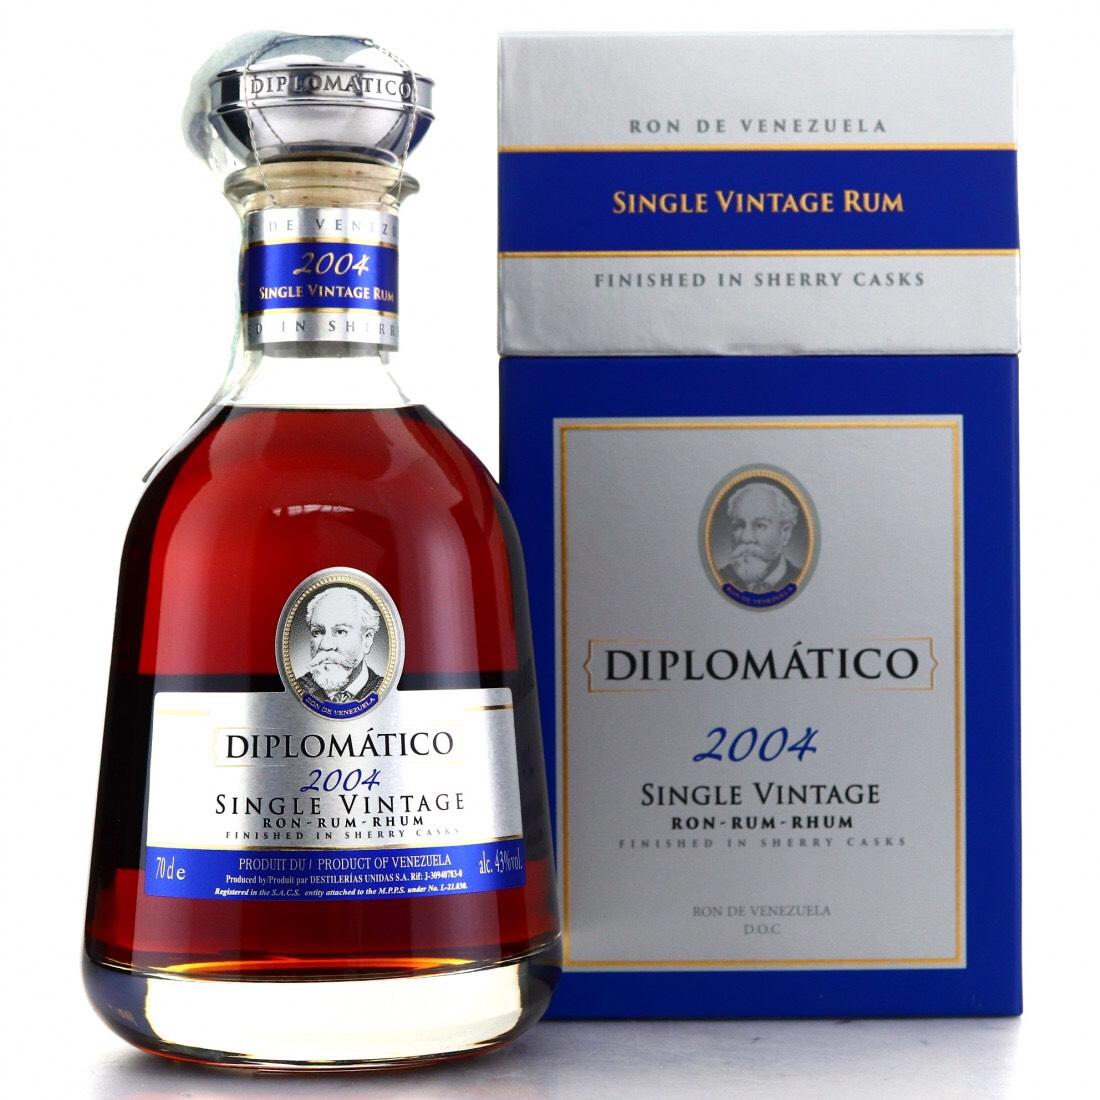 Bottle image of Diplomático / Botucal Single Vintage